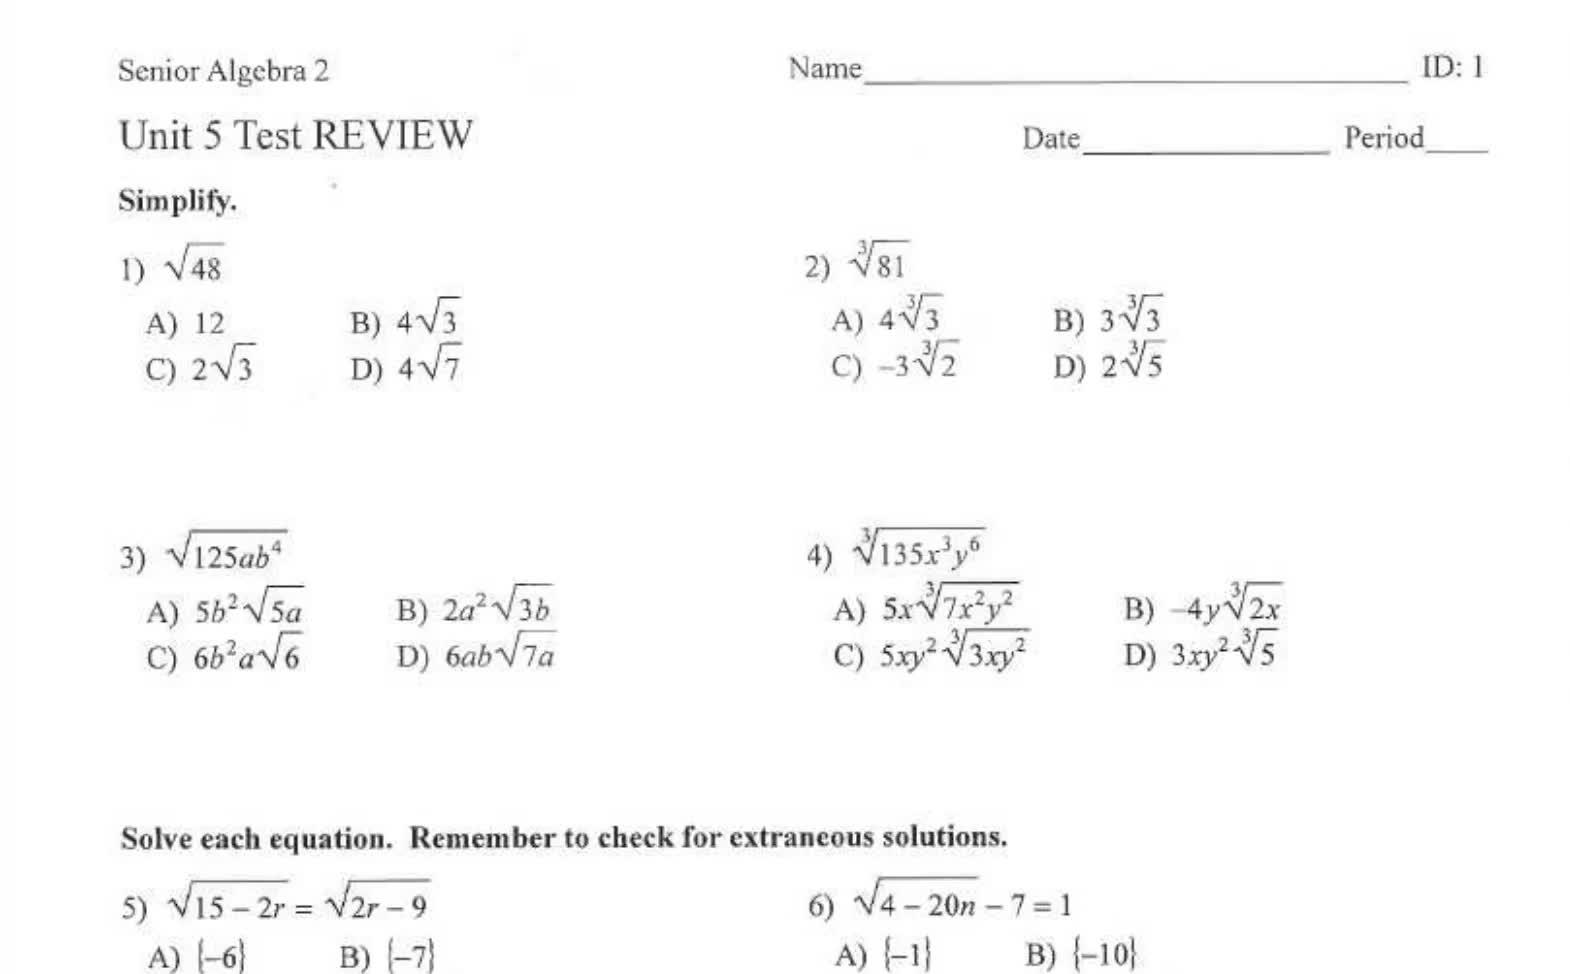 Sr Algebra 2 Unit 5 Test Review